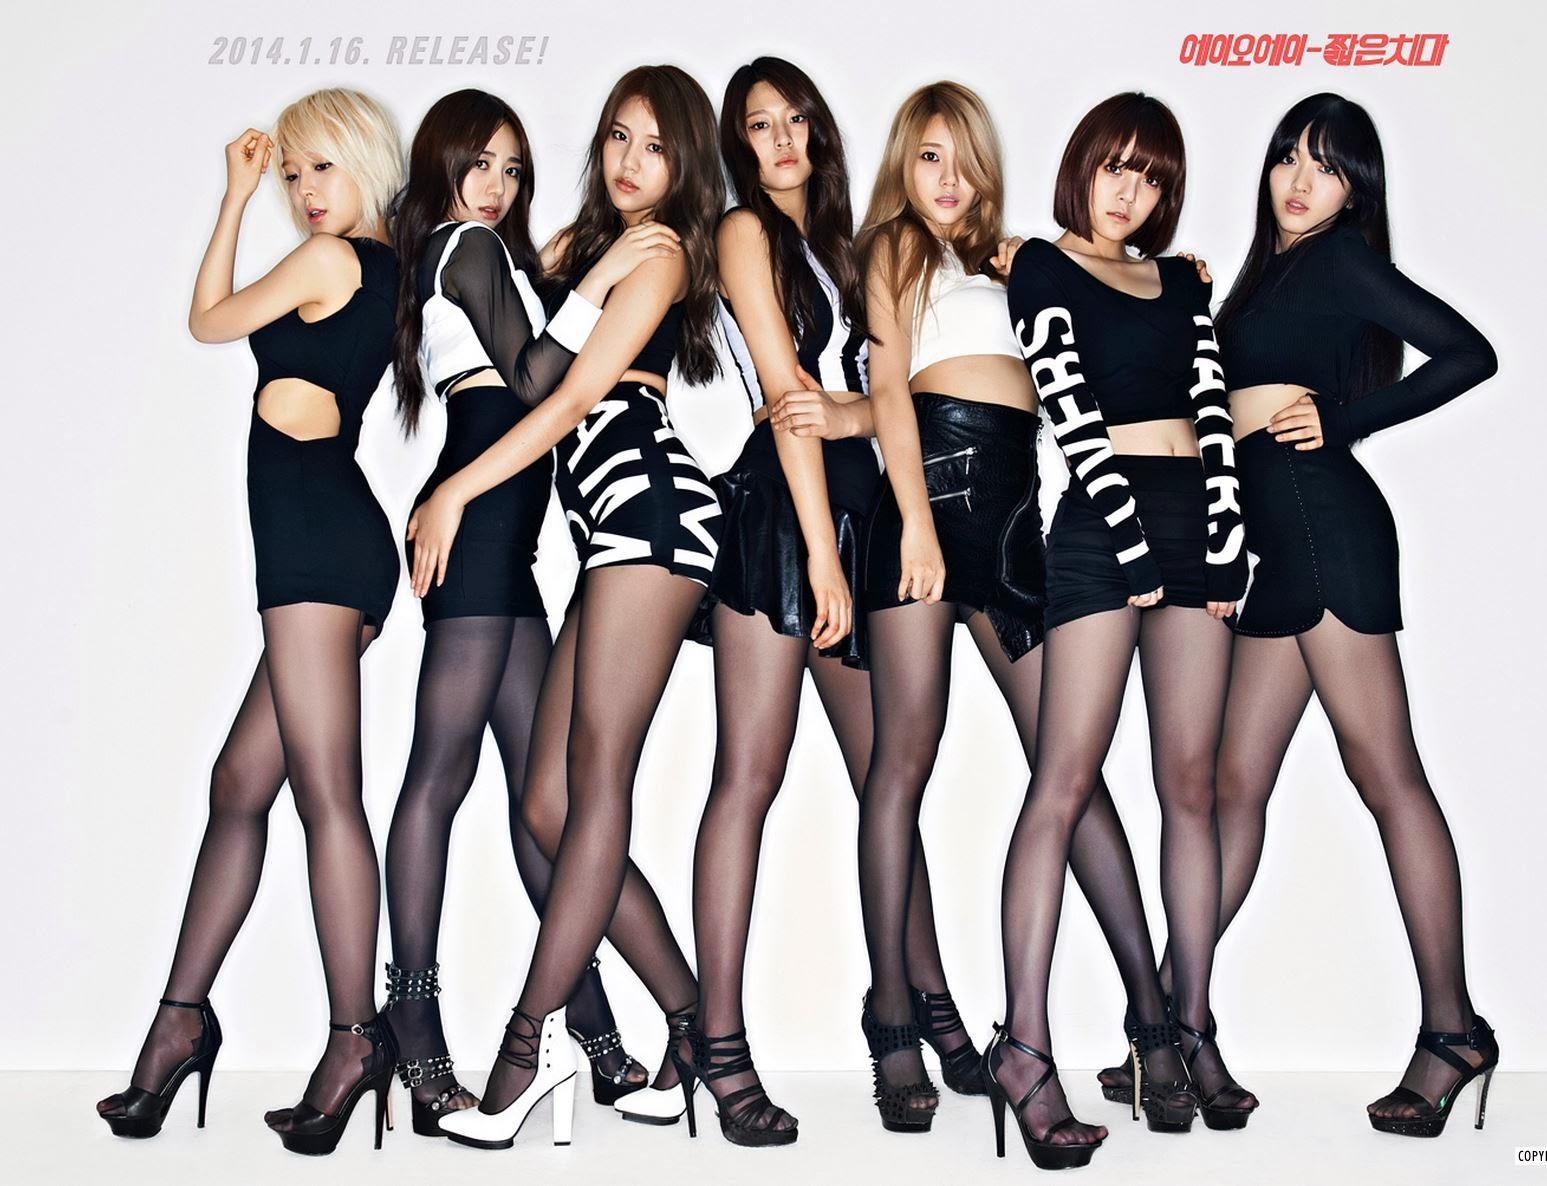 AOA Miniskirt 짧은 치마 Wallpaper HD